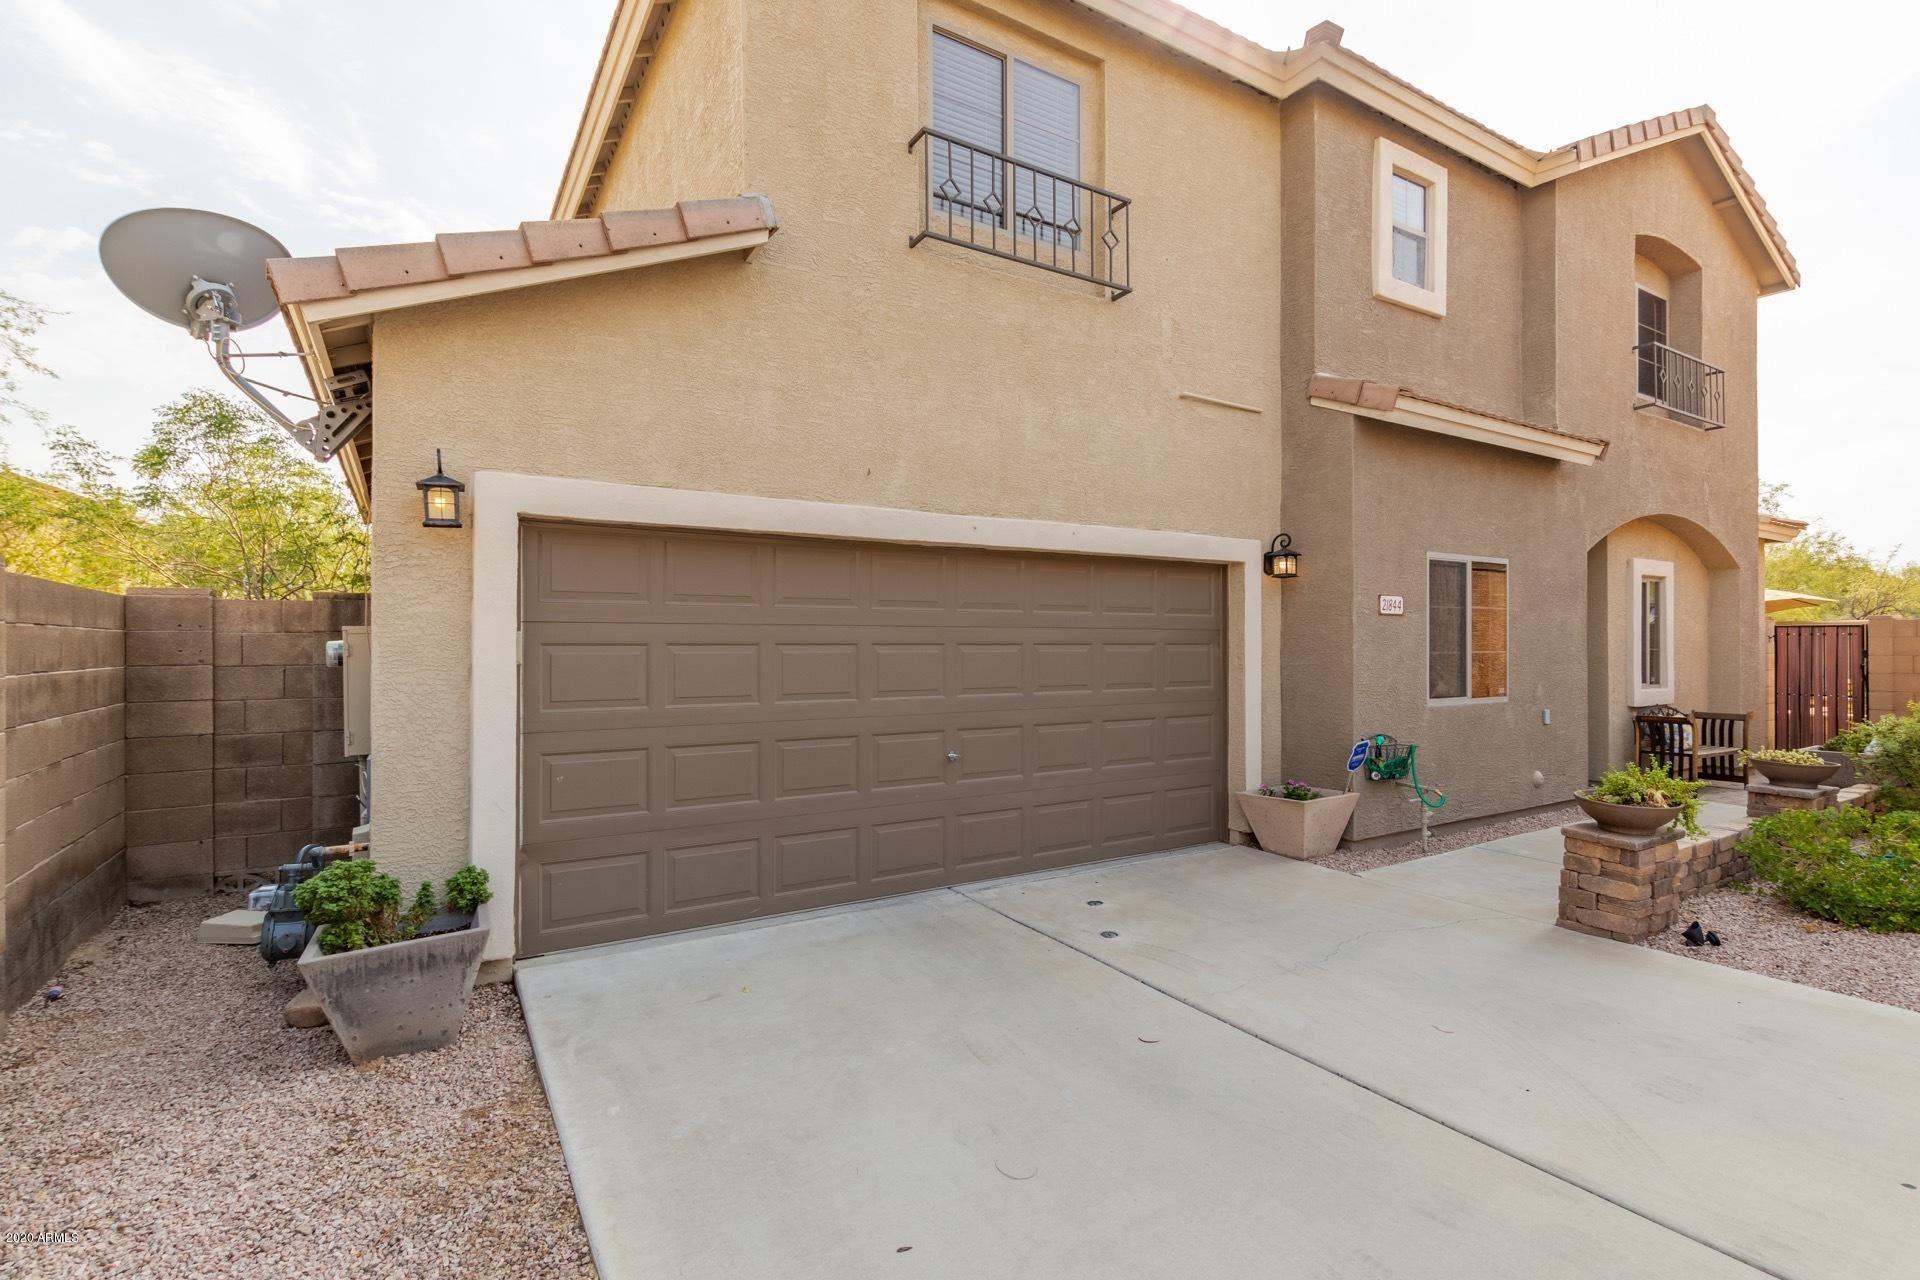 21844 N 40TH Place, Phoenix, AZ 85050 - MLS#: 6124658